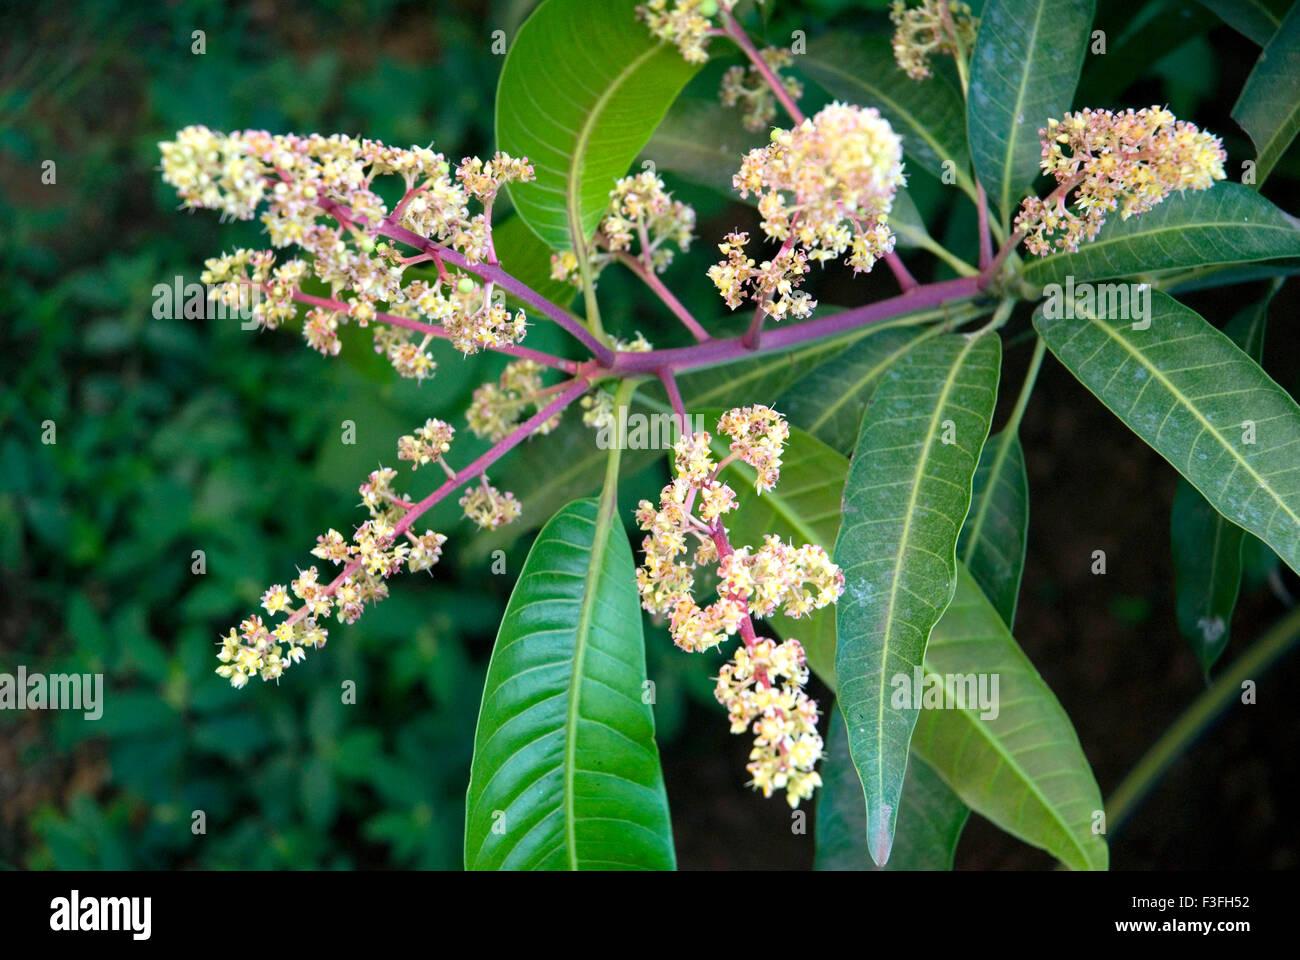 Mangobaum; Lateinischen Namen Mangifera indica Stockbild